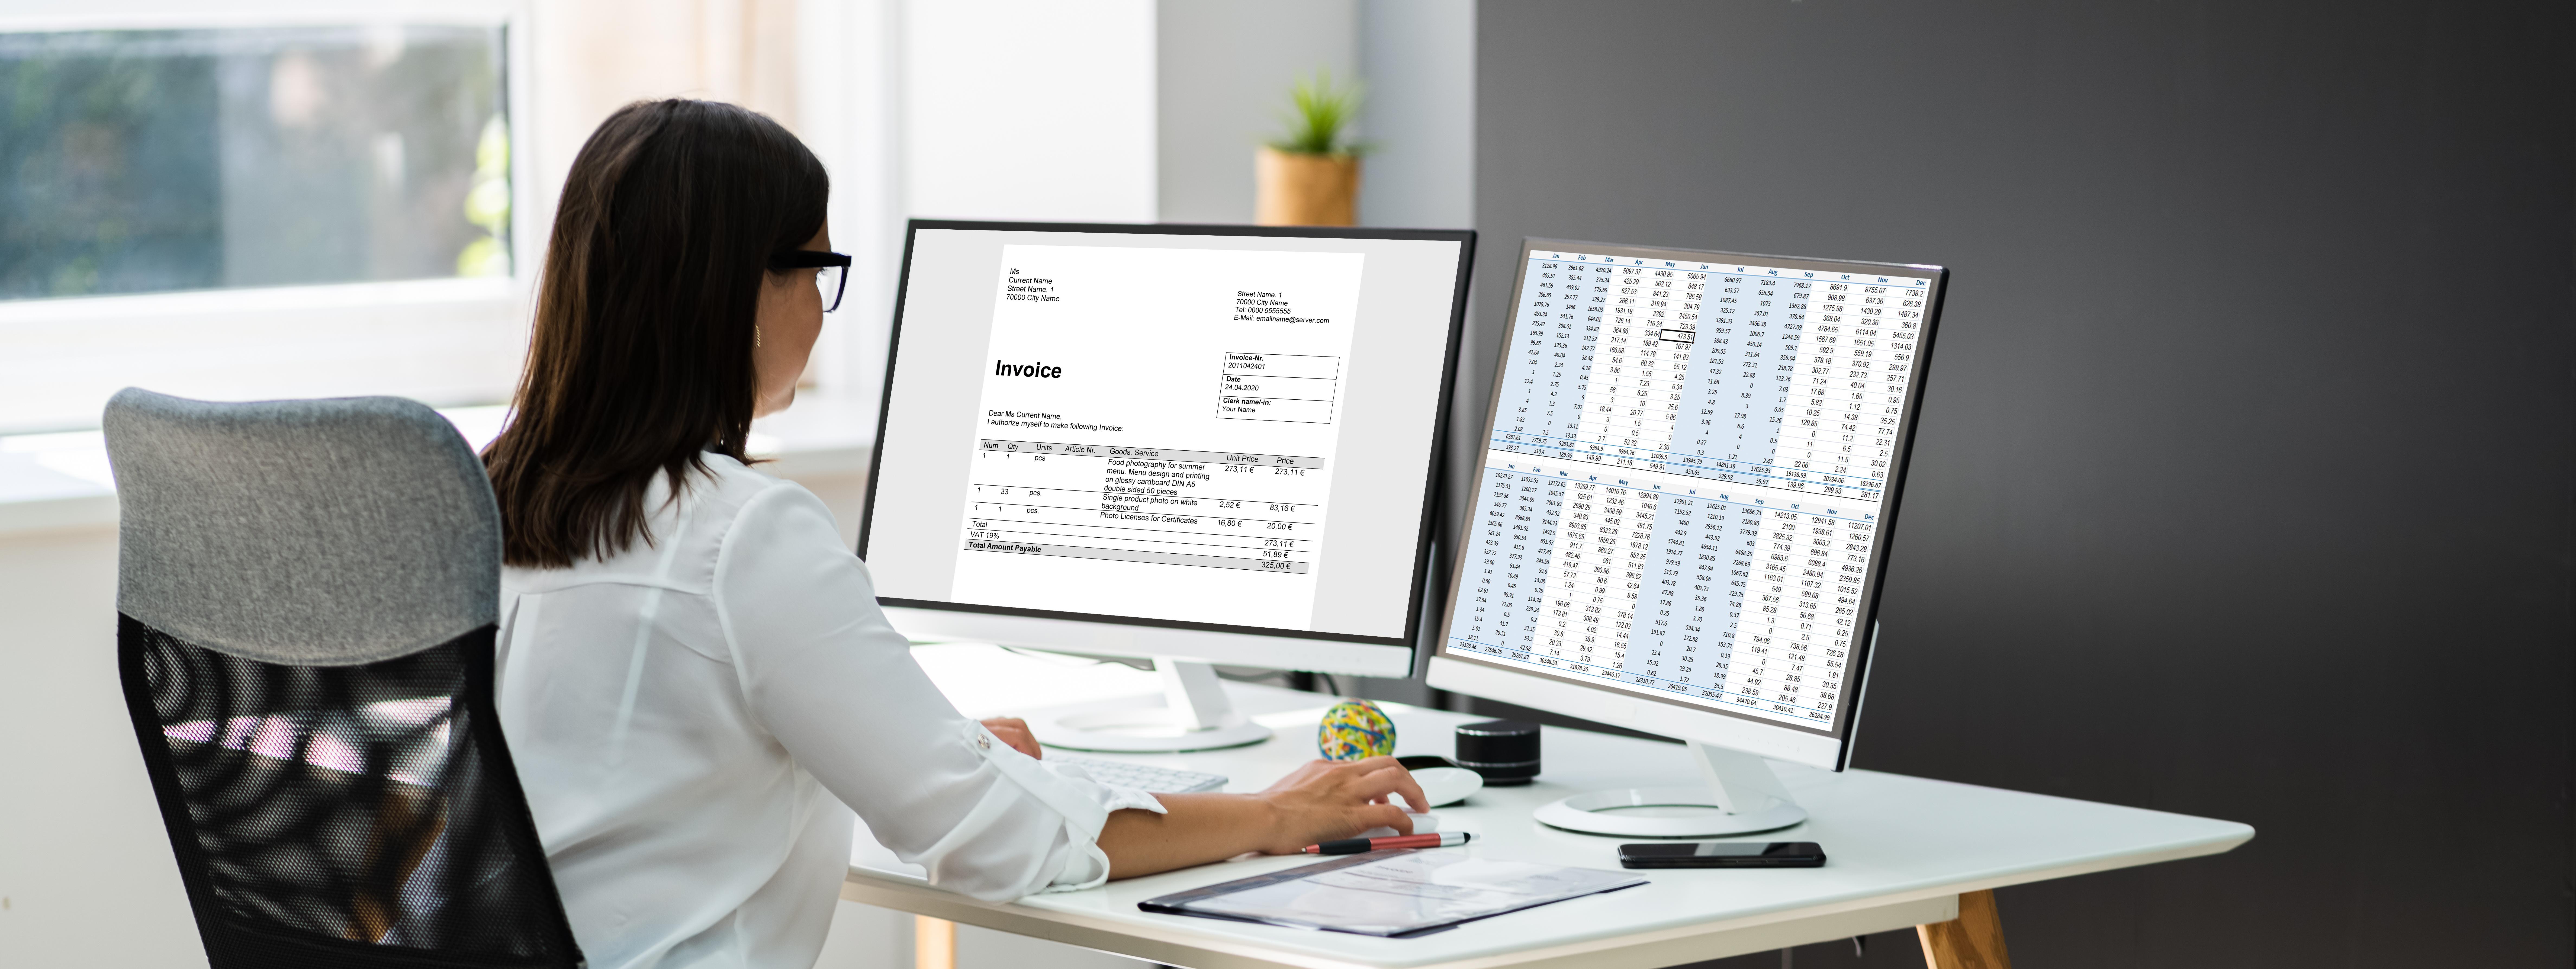 Online Invoice Management Software